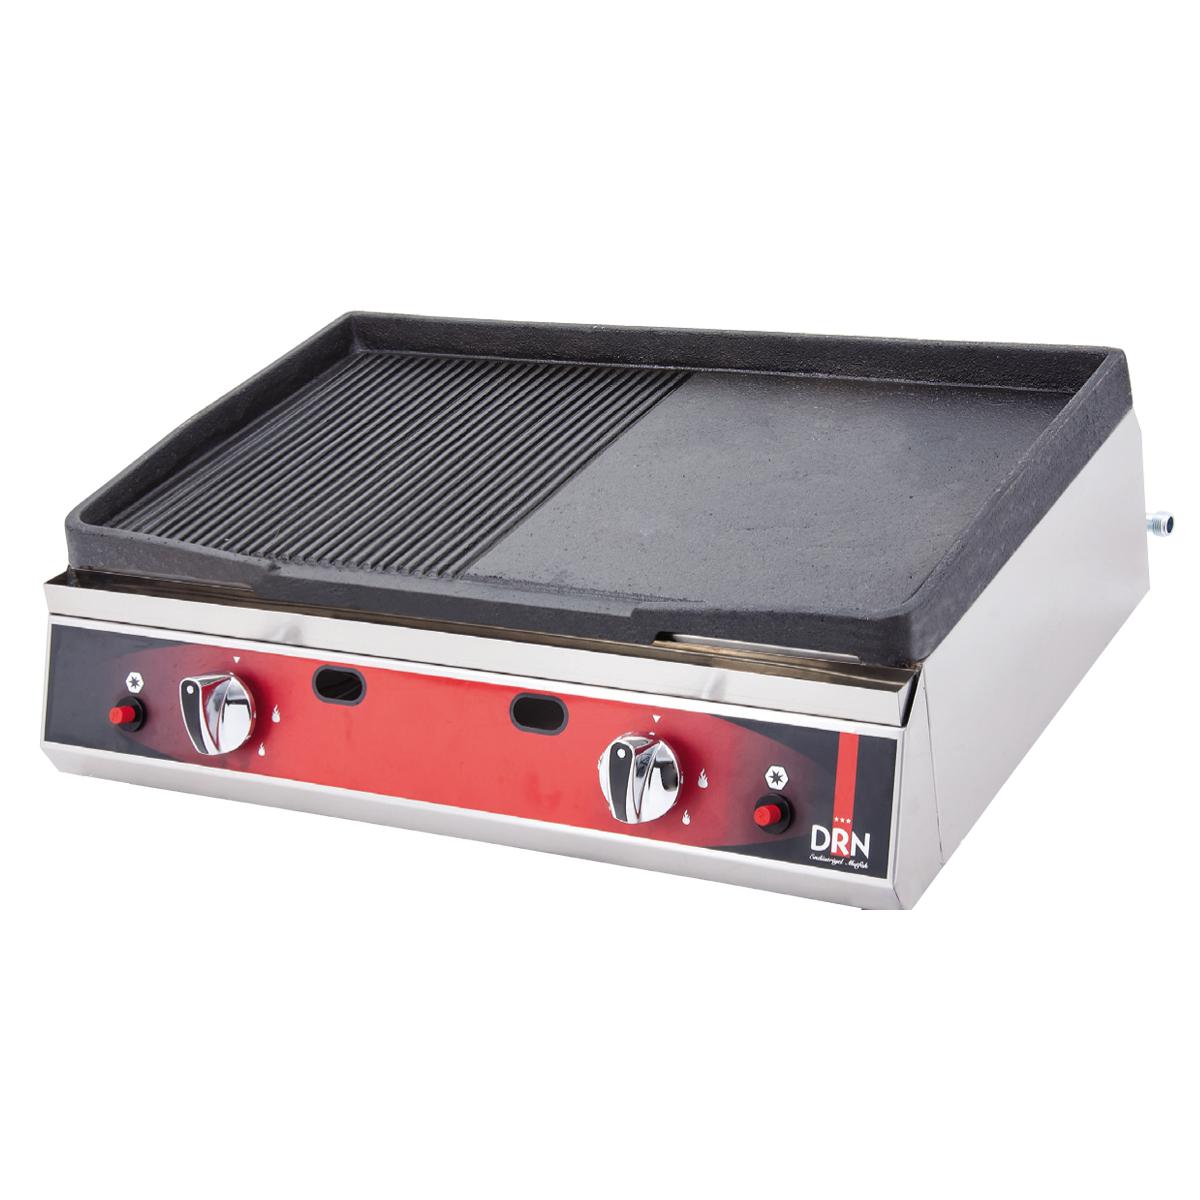 Cast iron grill - 70cm - lpg  drndizg-70-lpg